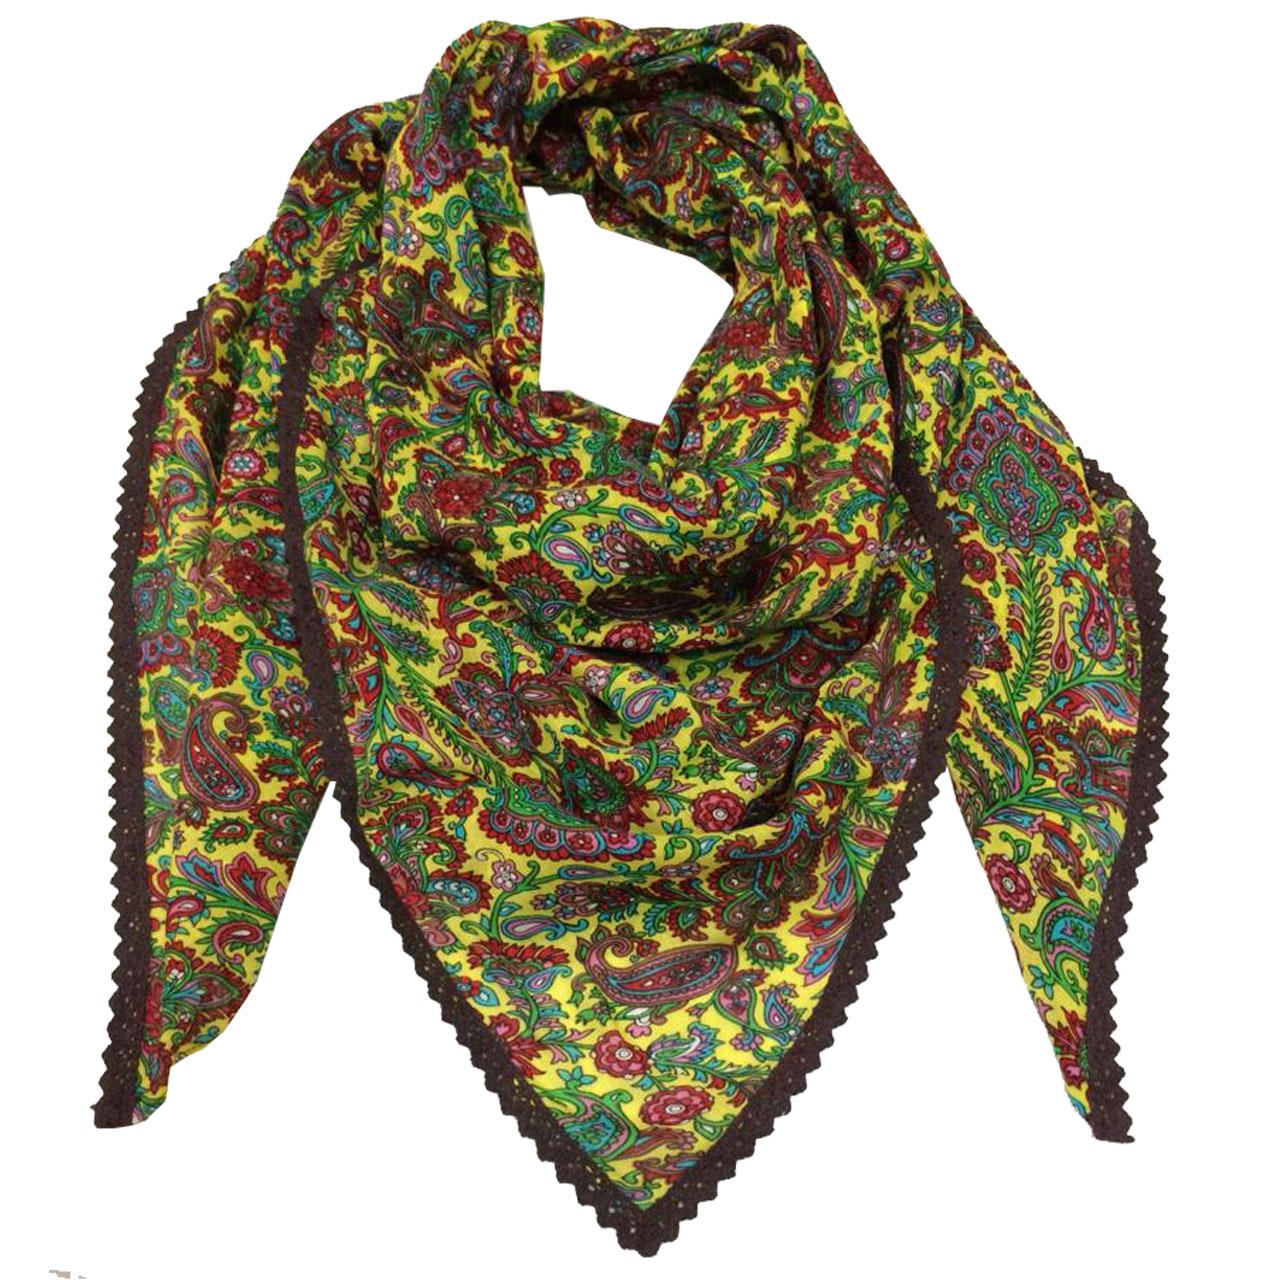 روسری نخی طرح گل دار کد 001